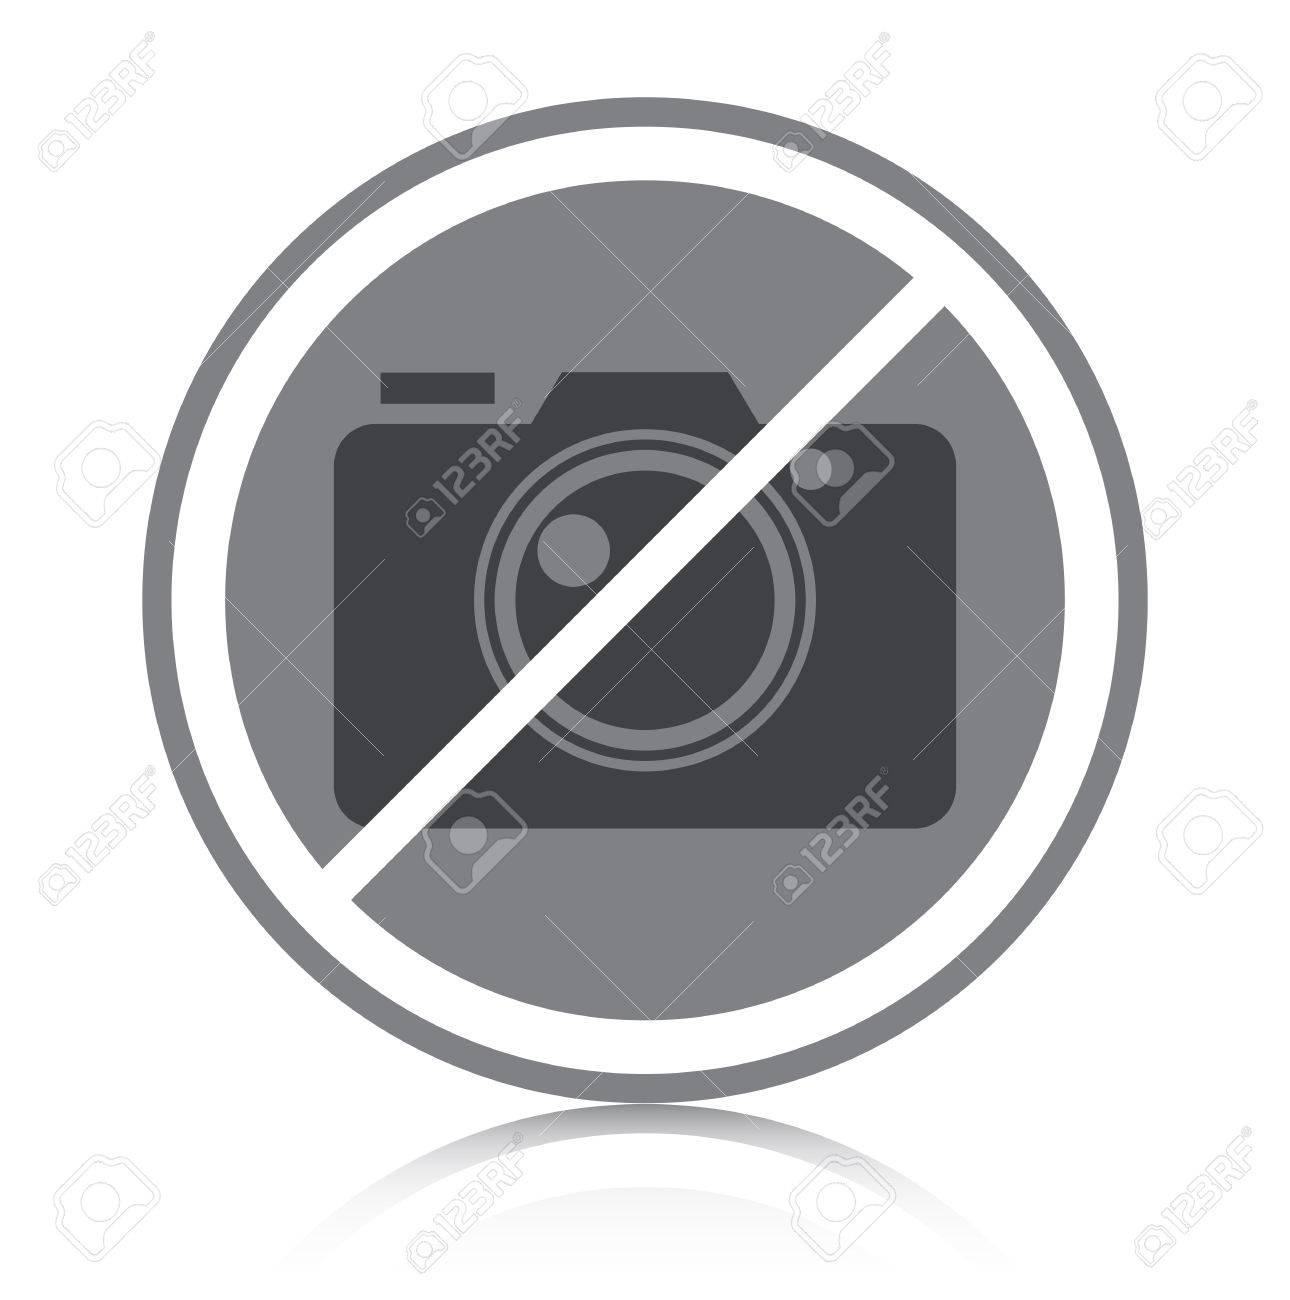 Prohibited symbol with white background - 23112549